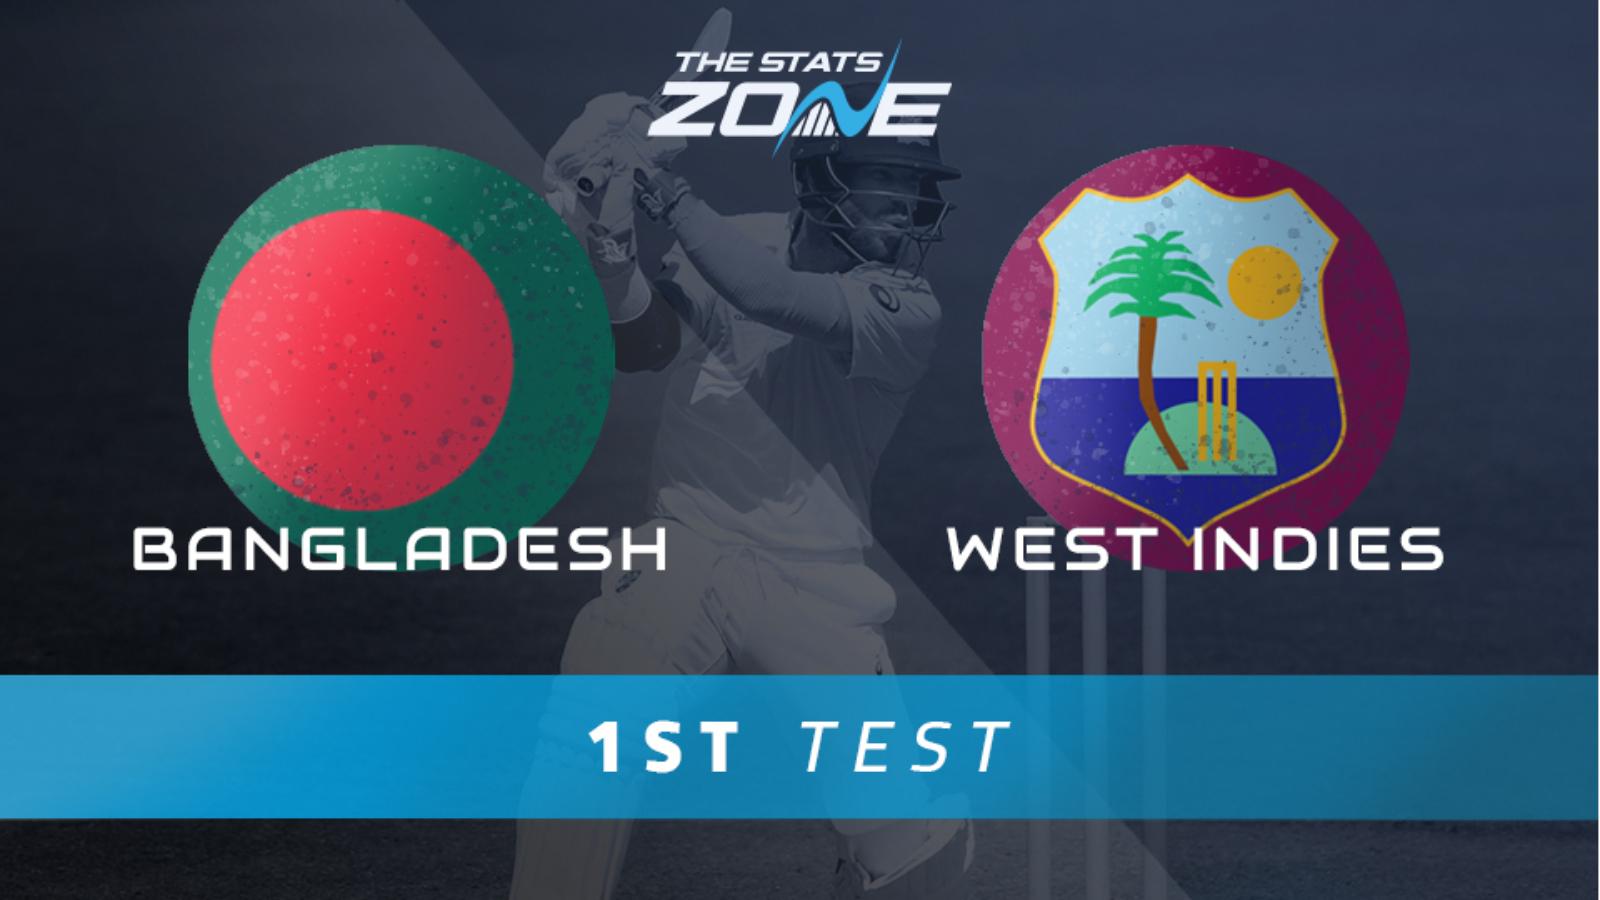 Bangladesh vs West Indies 1st Test 2021 Live Score